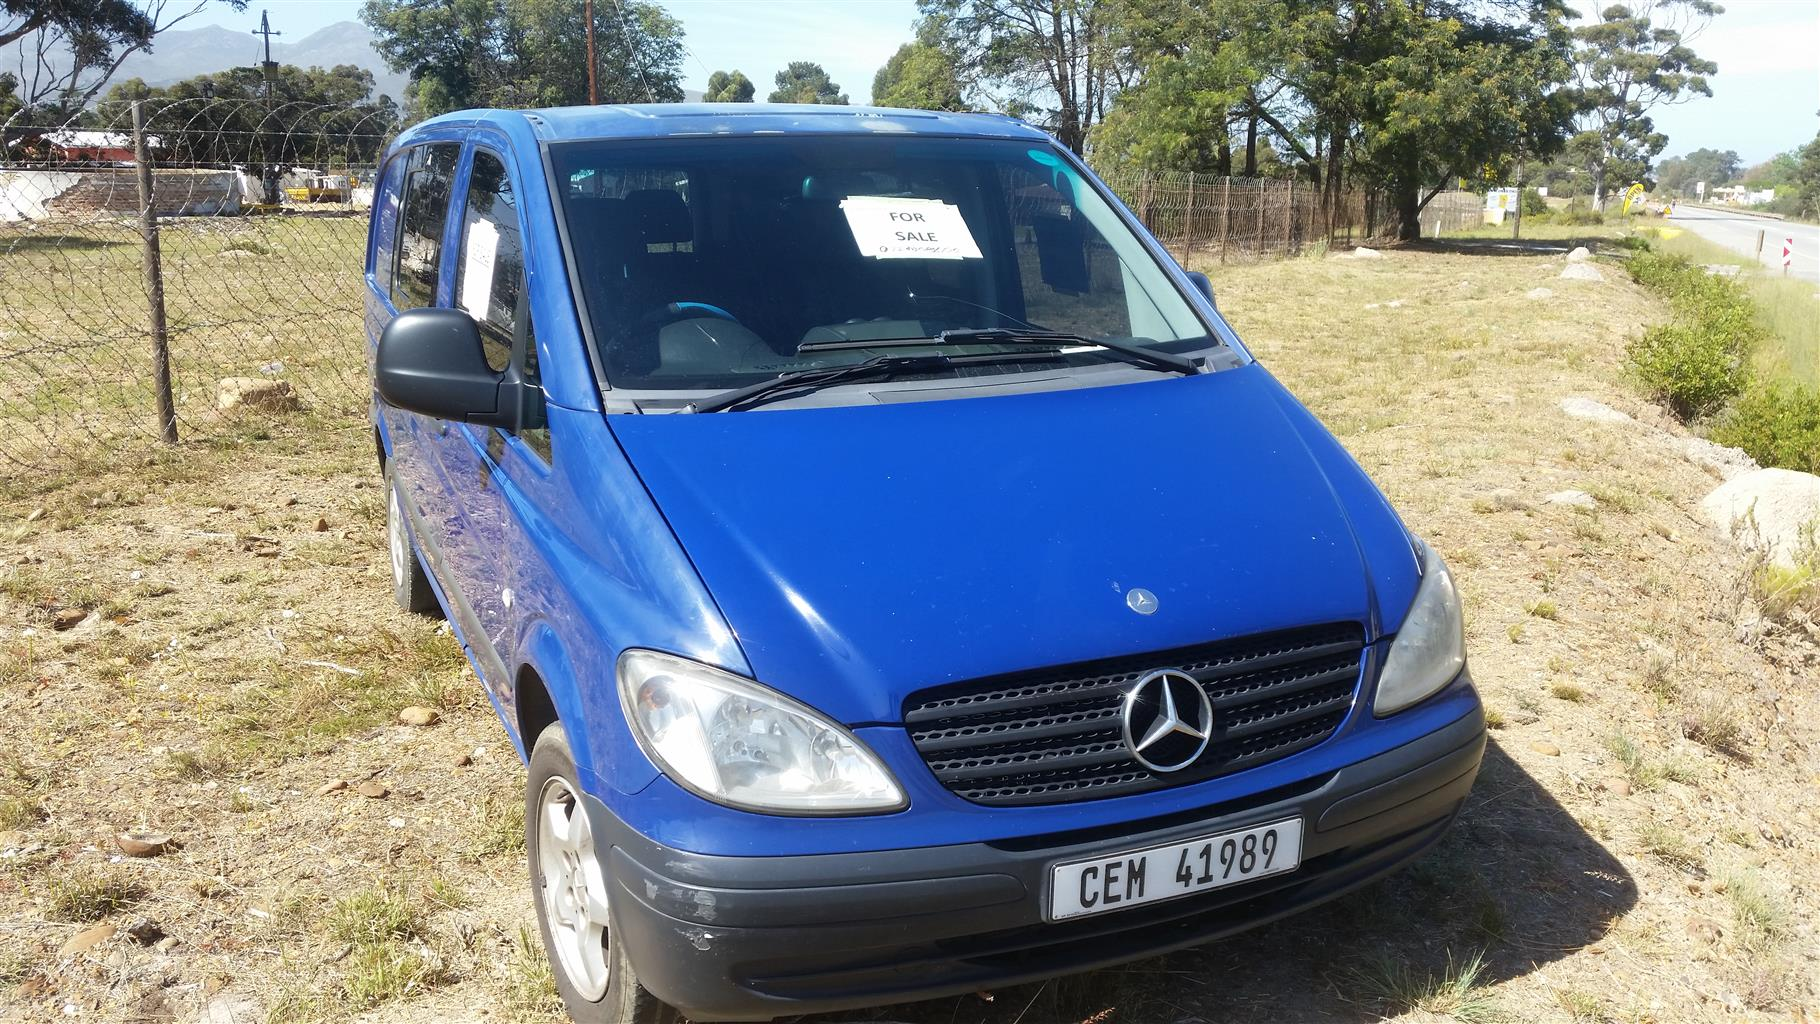 2006 Mercedes Benz Vito 115 CDI 2.2 crew cab